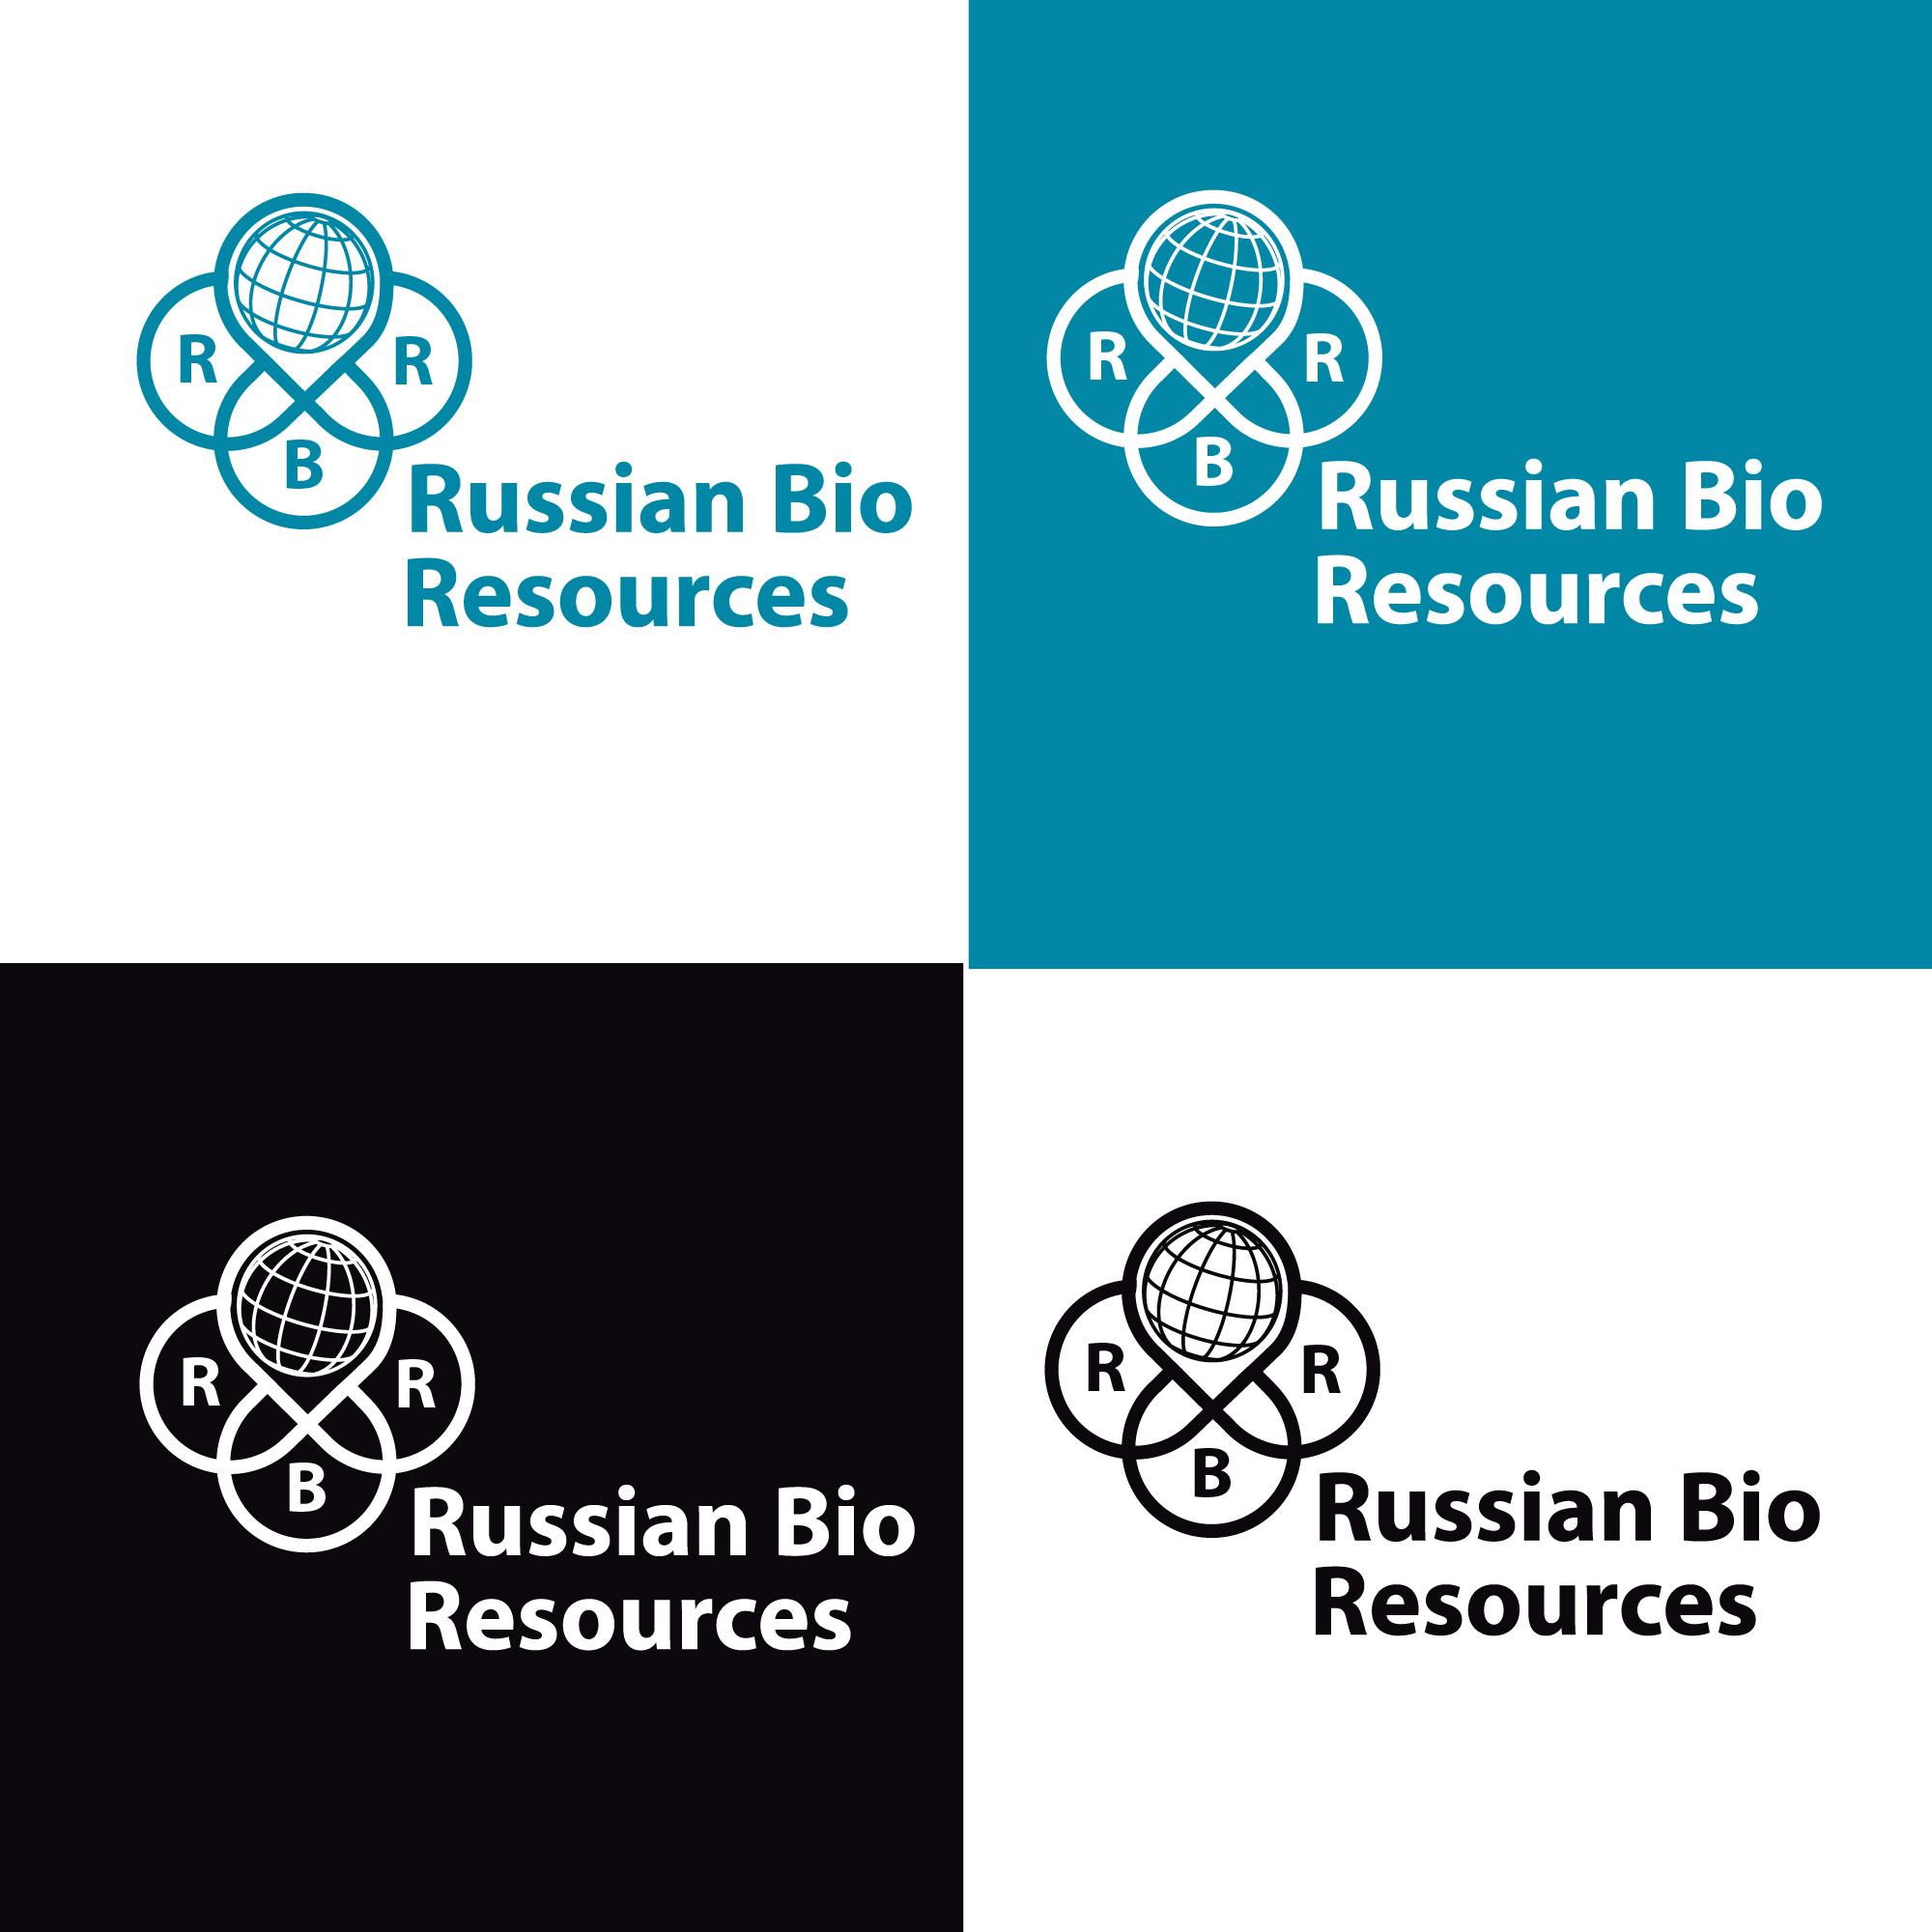 Разработка логотипа для компании «Русские Био Ресурсы» фото f_73558fb7e0ec6f3b.jpg